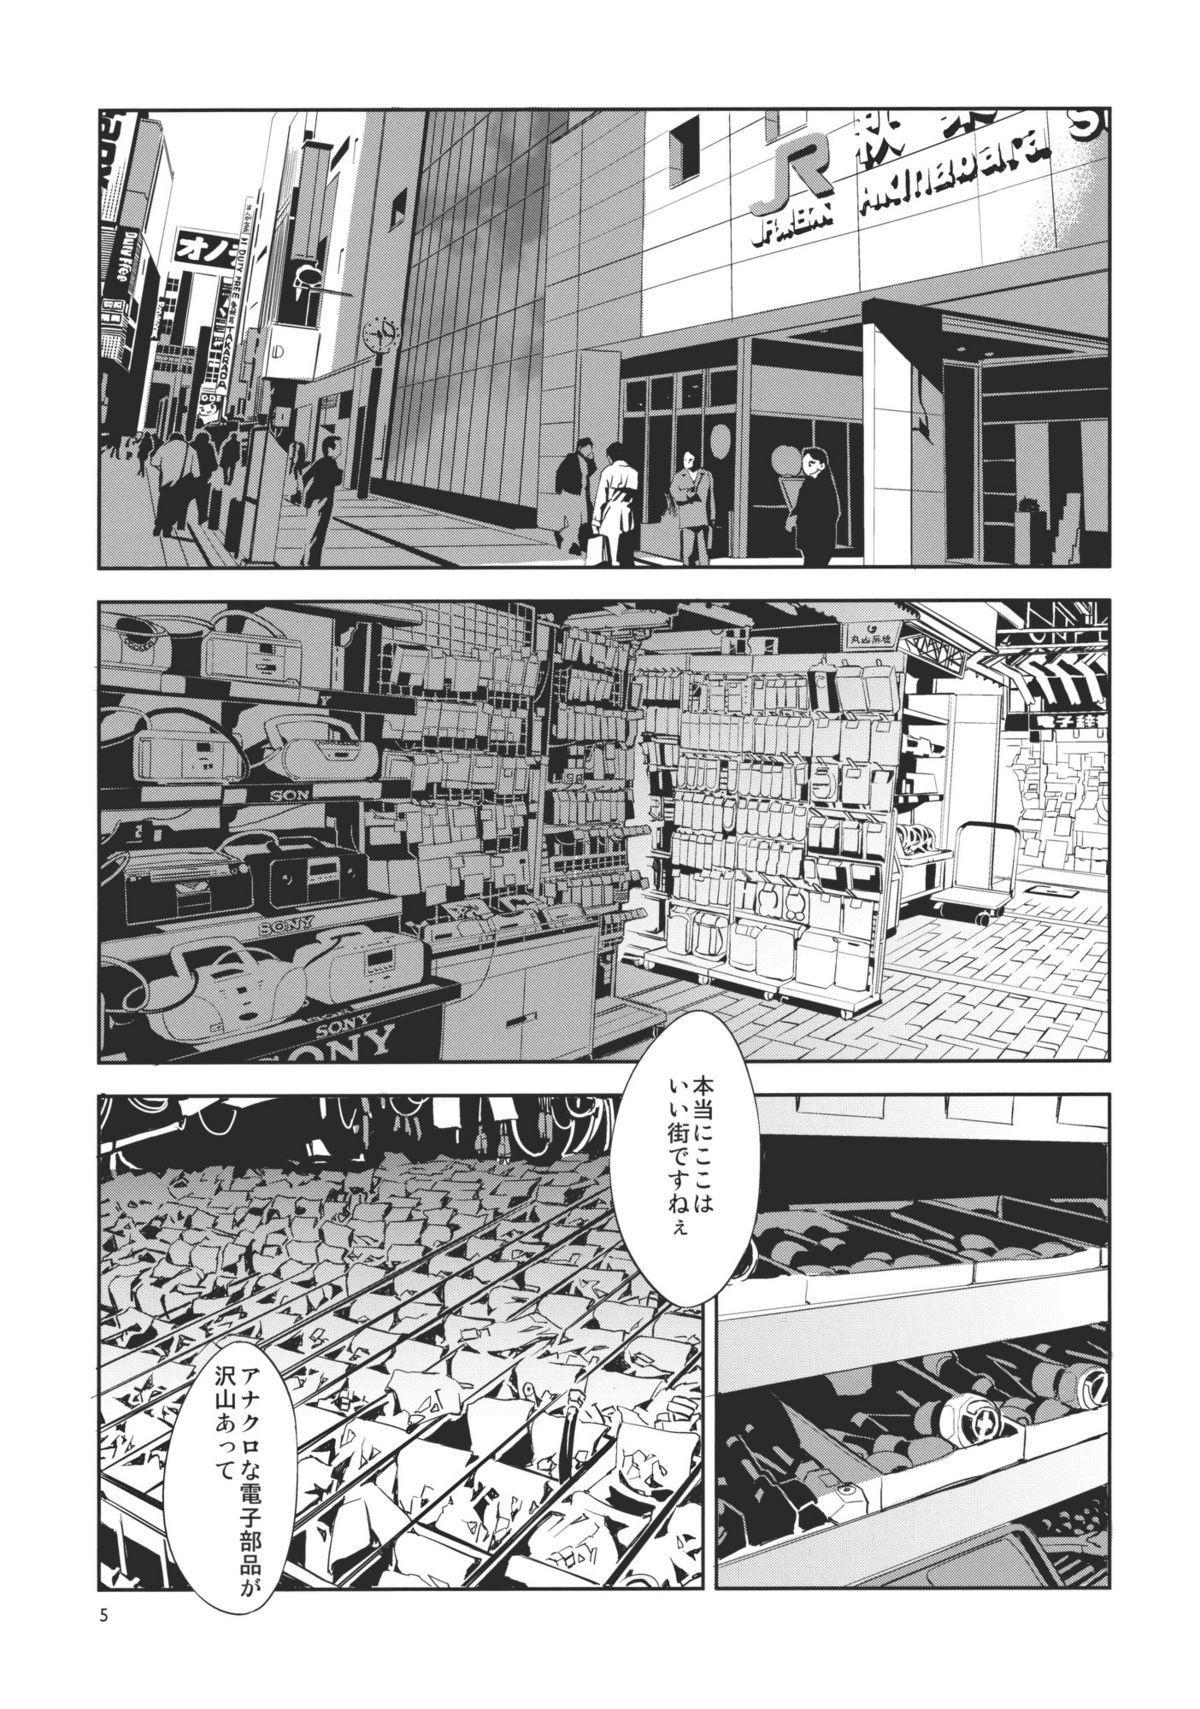 Touhou Gensou Houkai 4